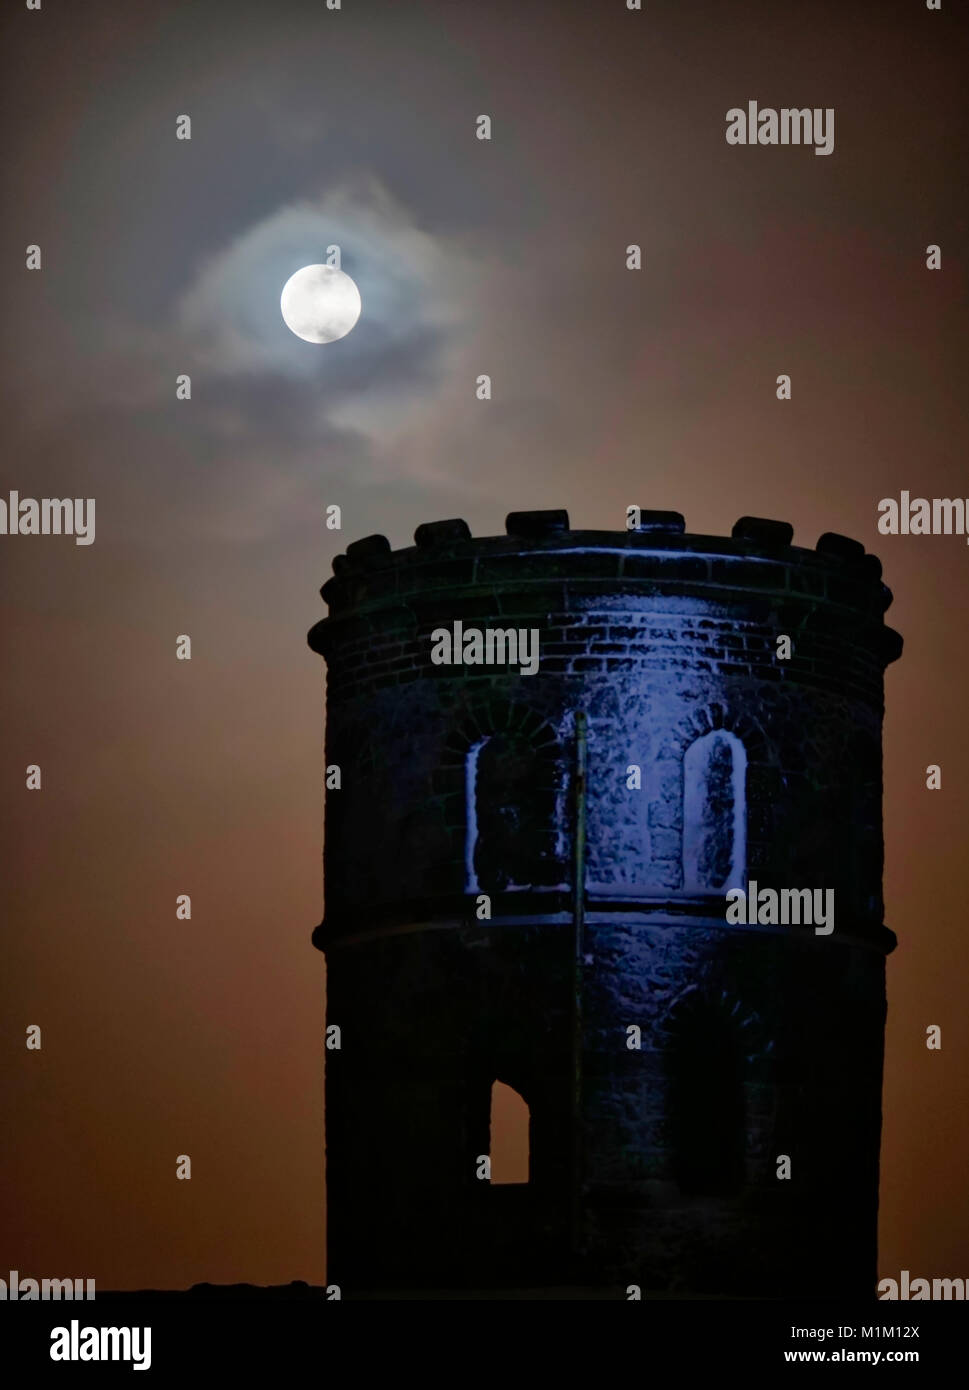 Buxton, UK. 31st Jan, 2018. UK Weather: super blue blood full moon Solomon's Temple Buxton Derbyshire, also - Stock Image